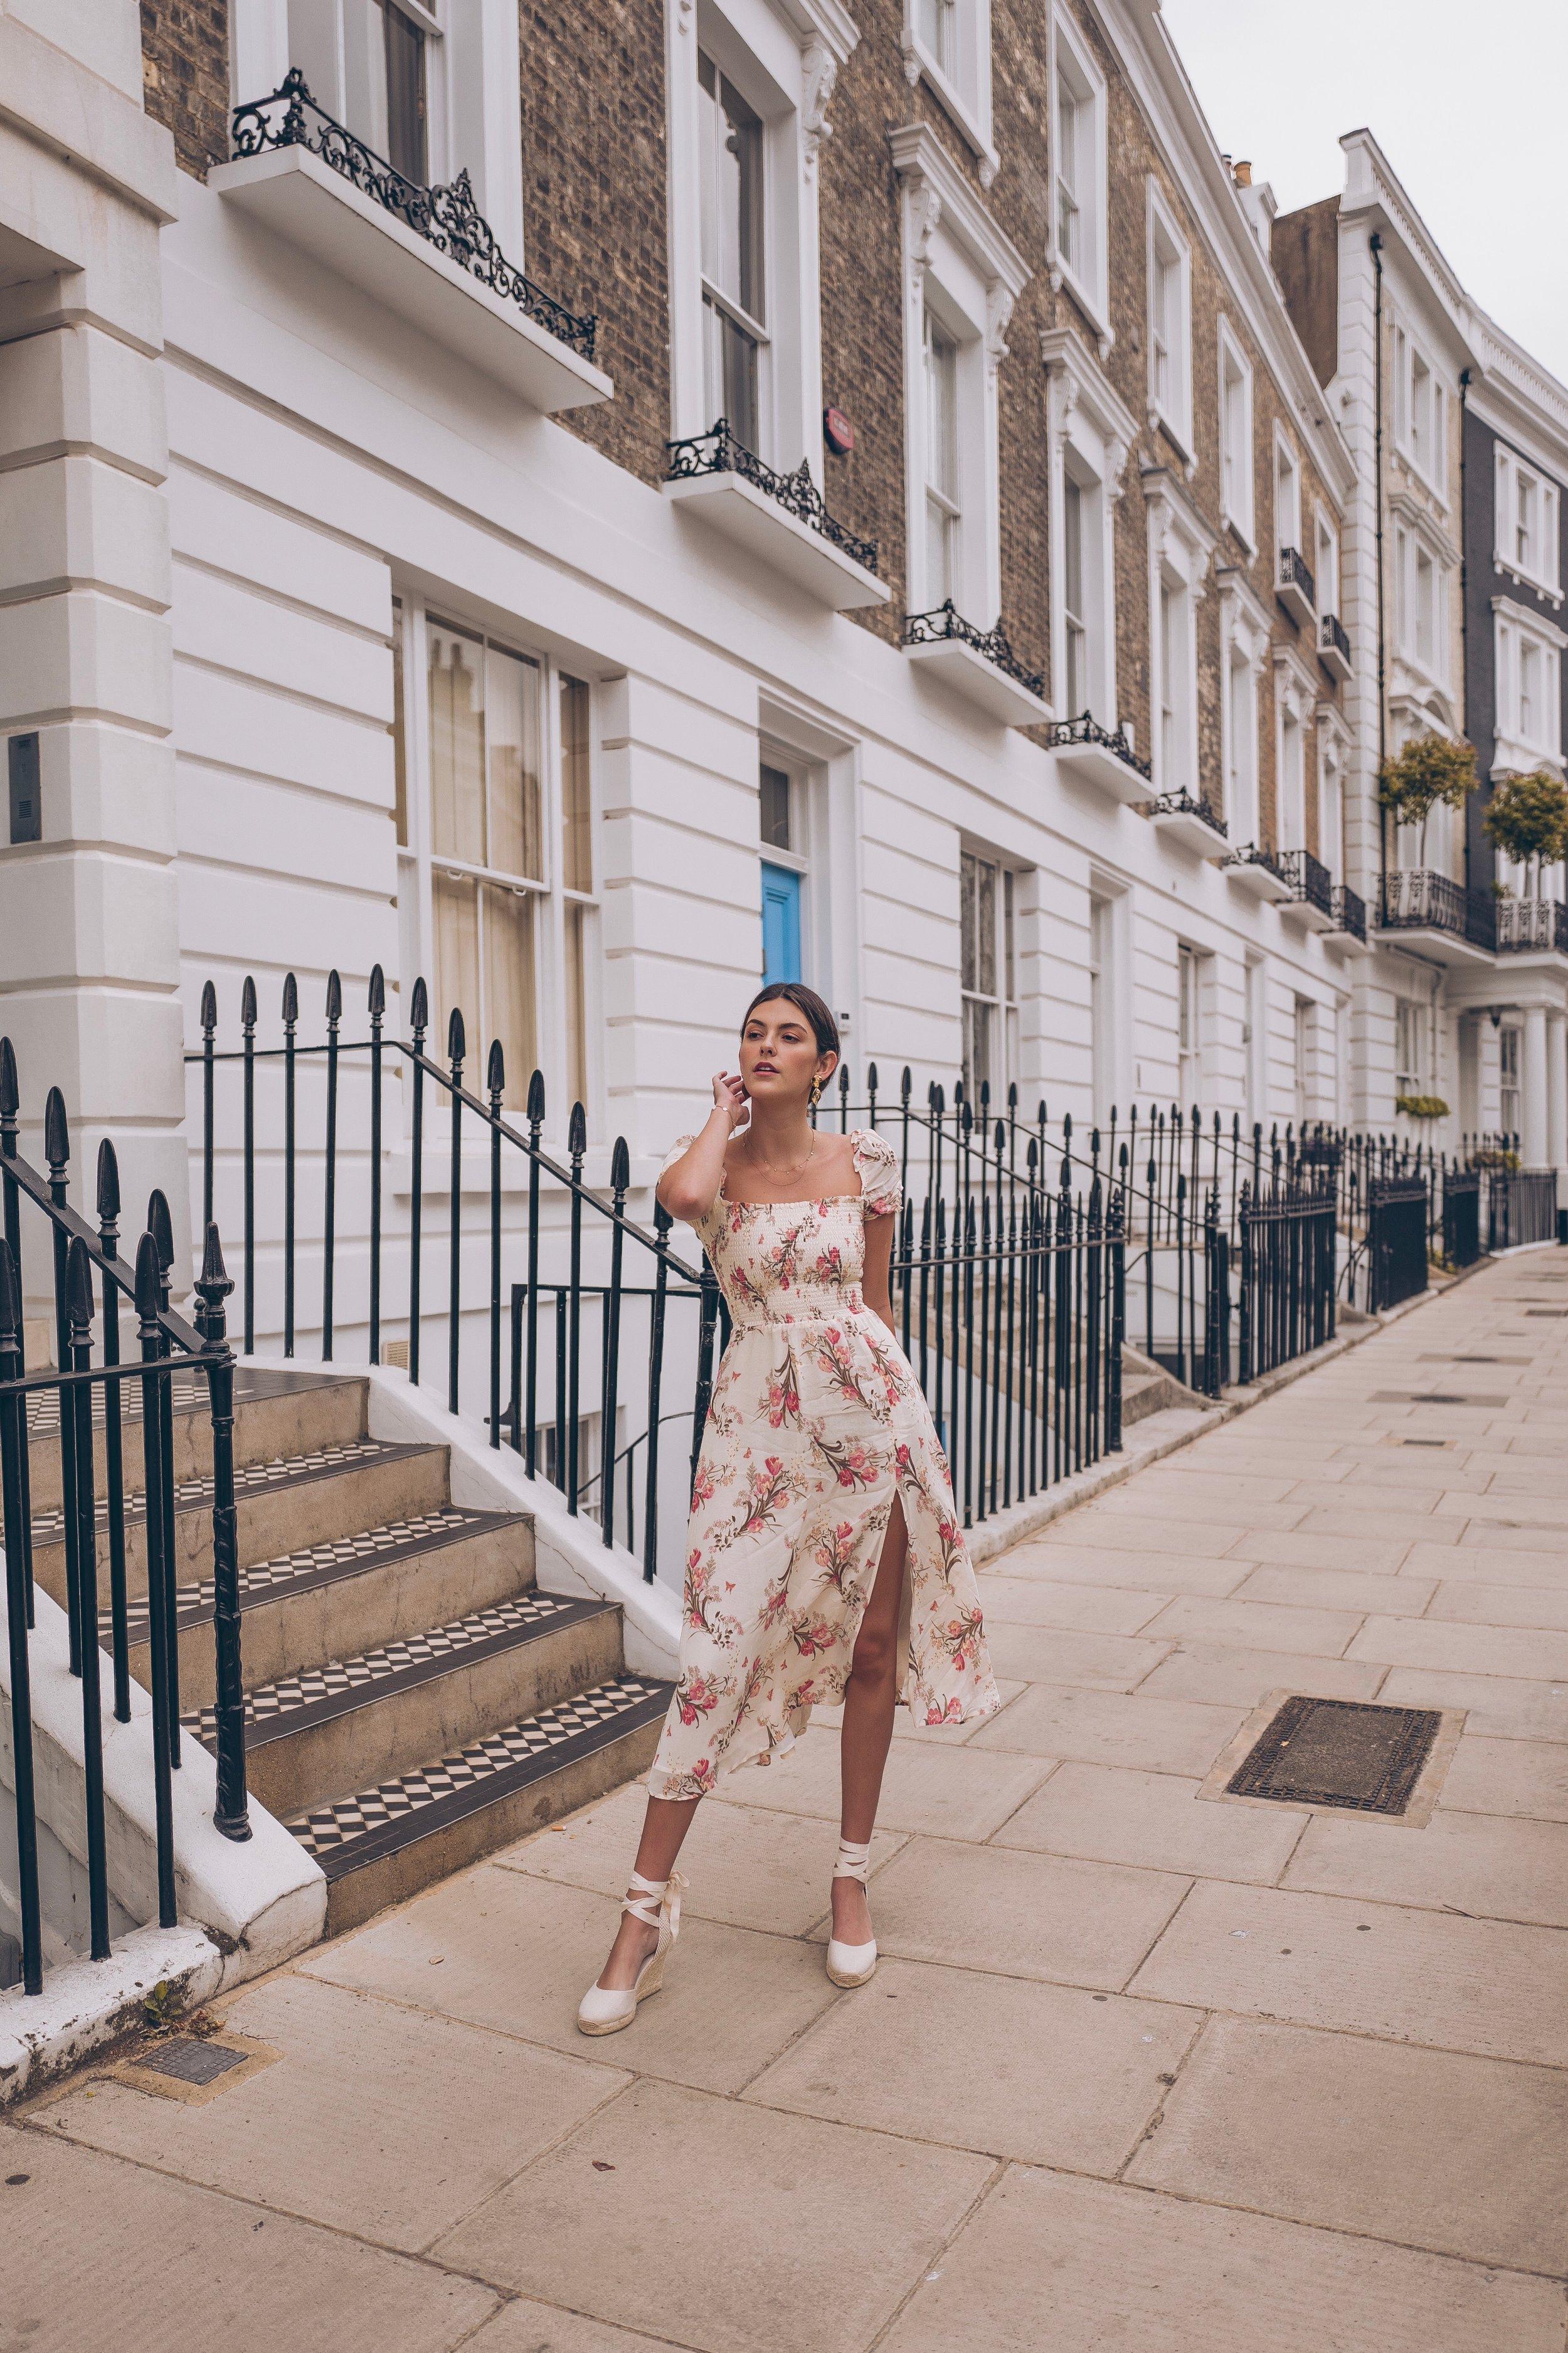 Julia friedman notting hill reformation dress London